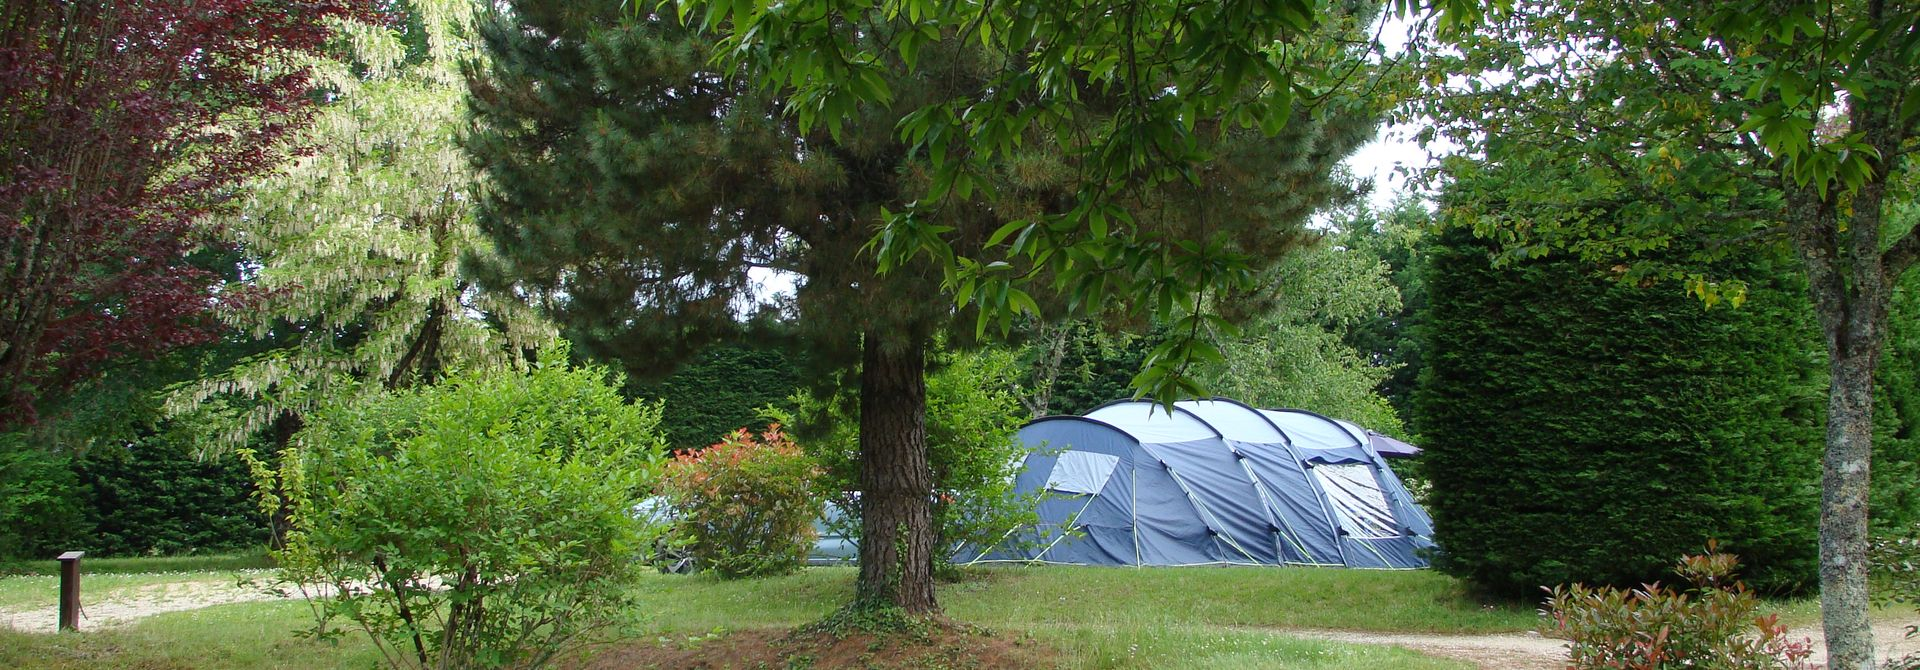 Camping en Pleine Nature - Camping Le Rêve